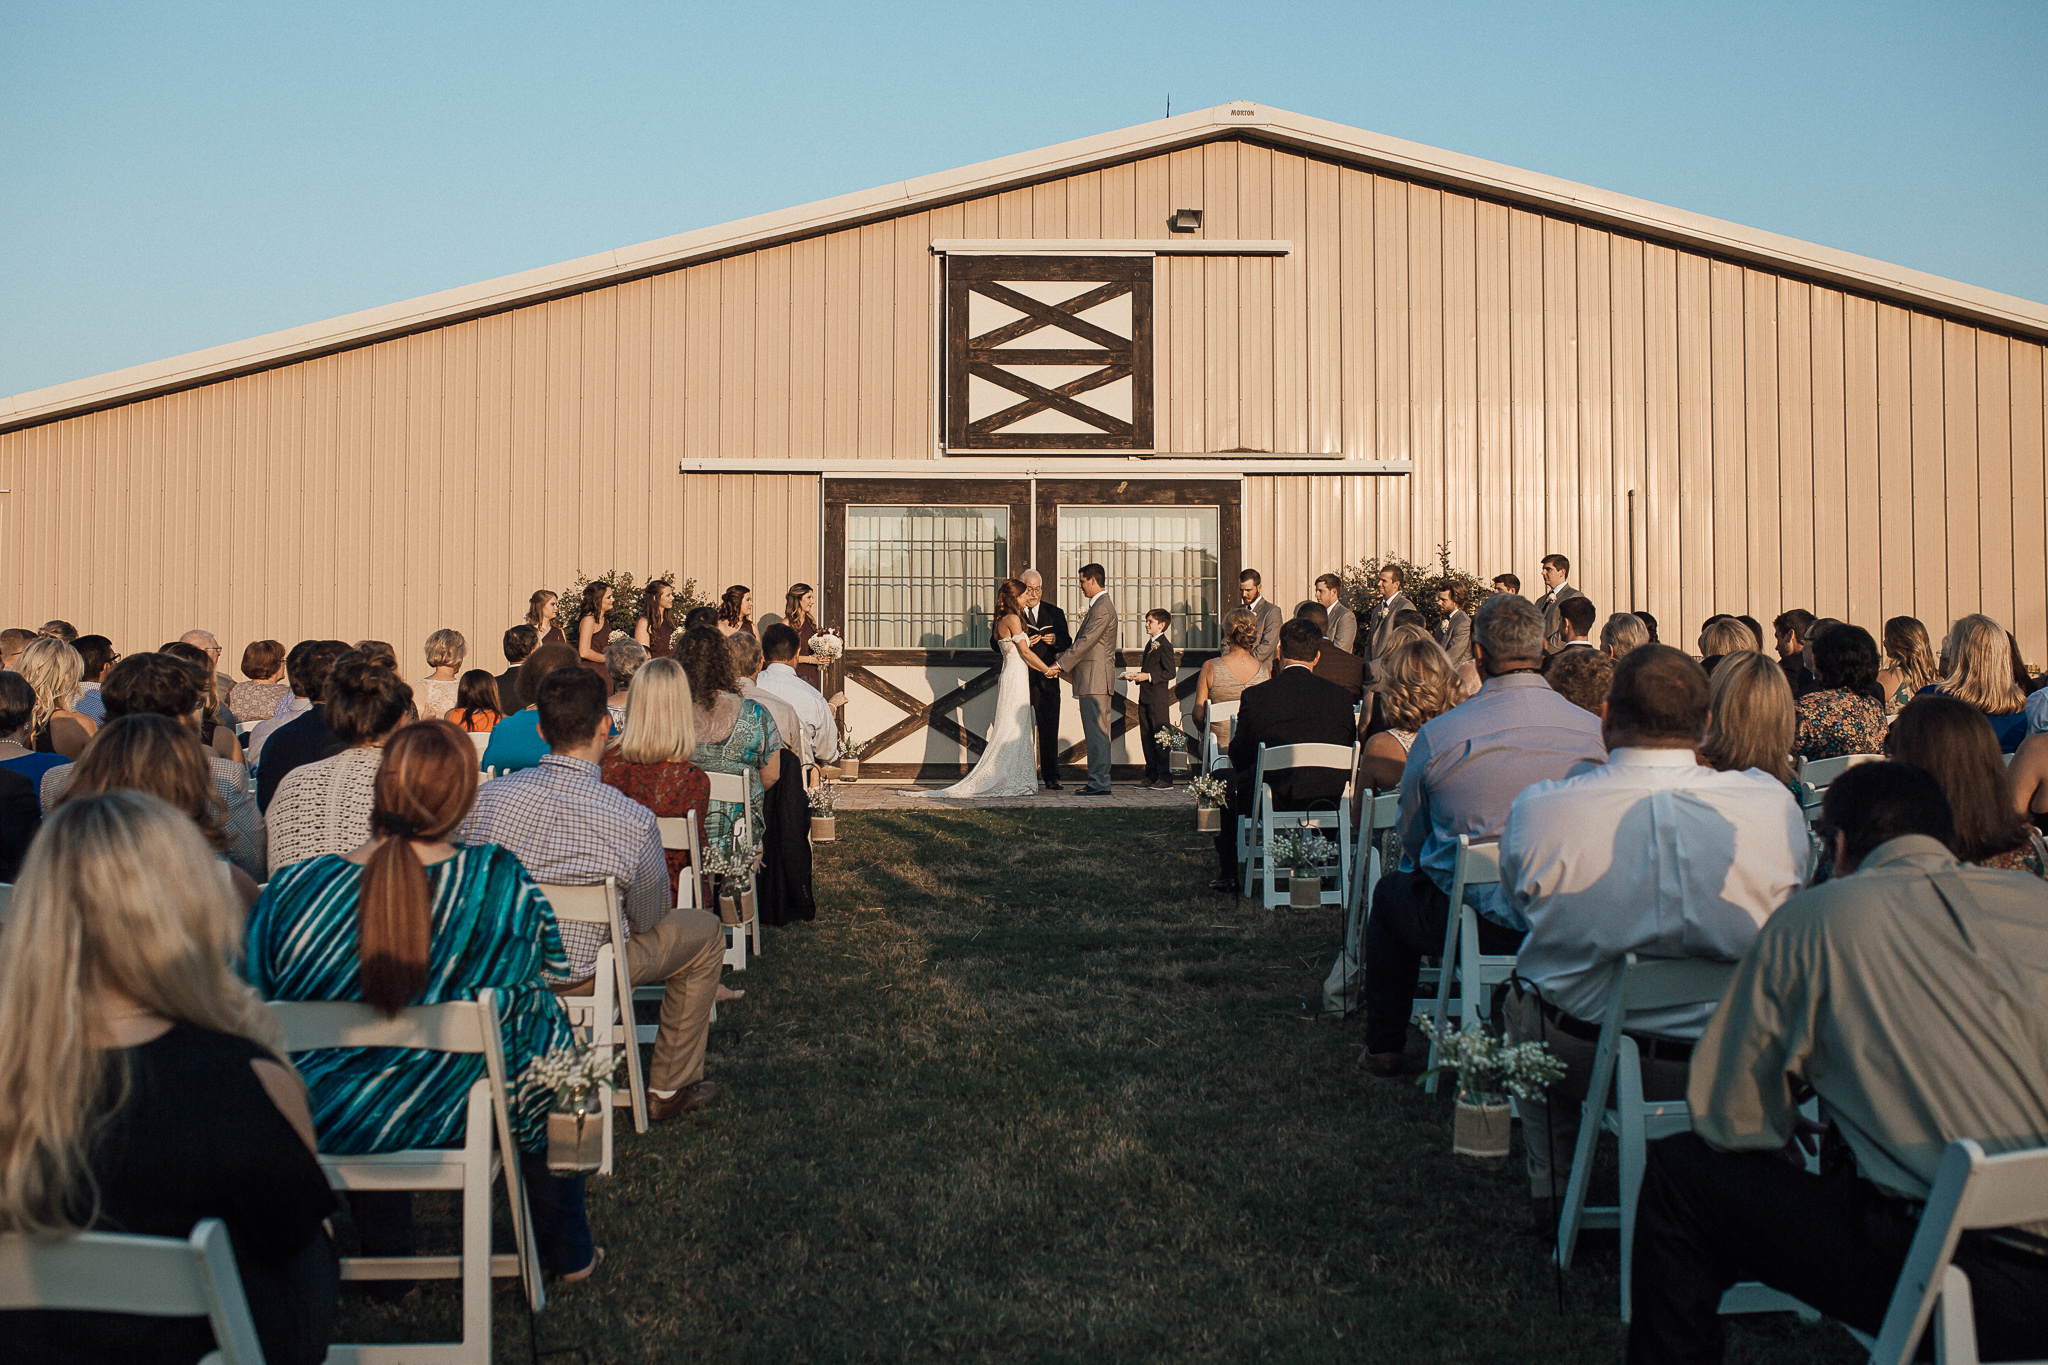 memphis-wedding-photographer-cedar-hill-farms-wedding-venue